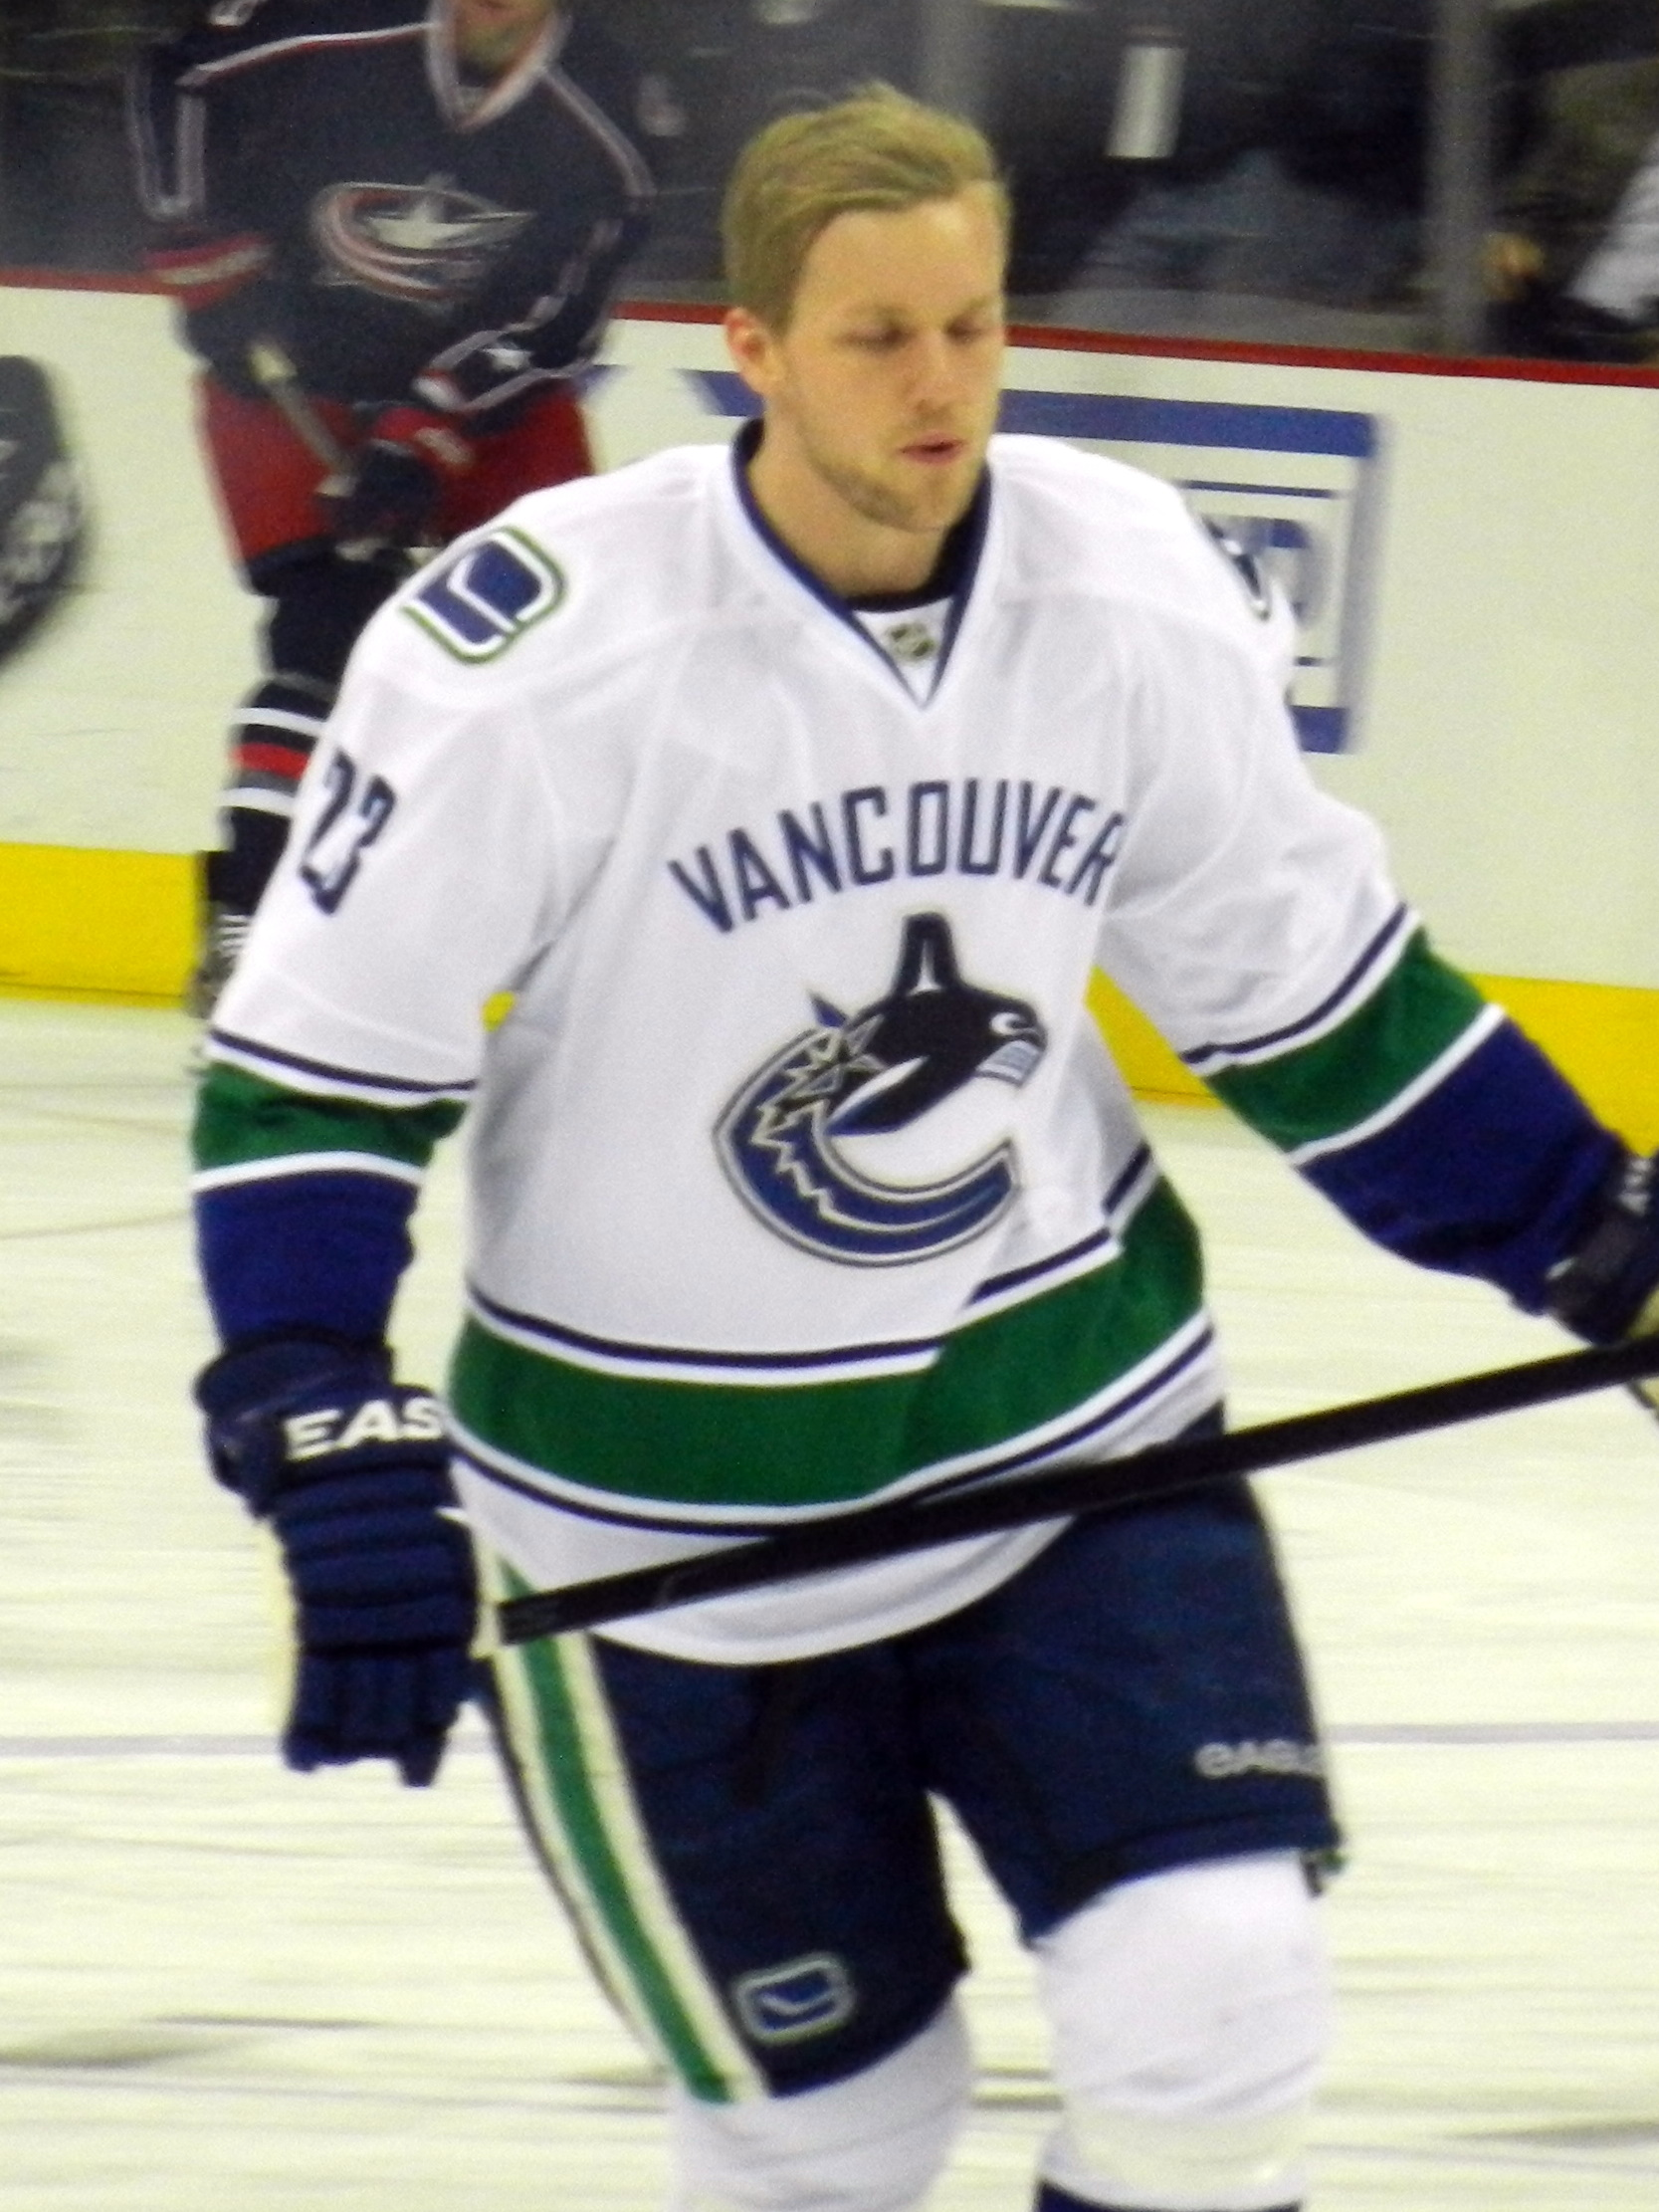 Alexander Edler Vancouver Canucks Player Swingman Jersey